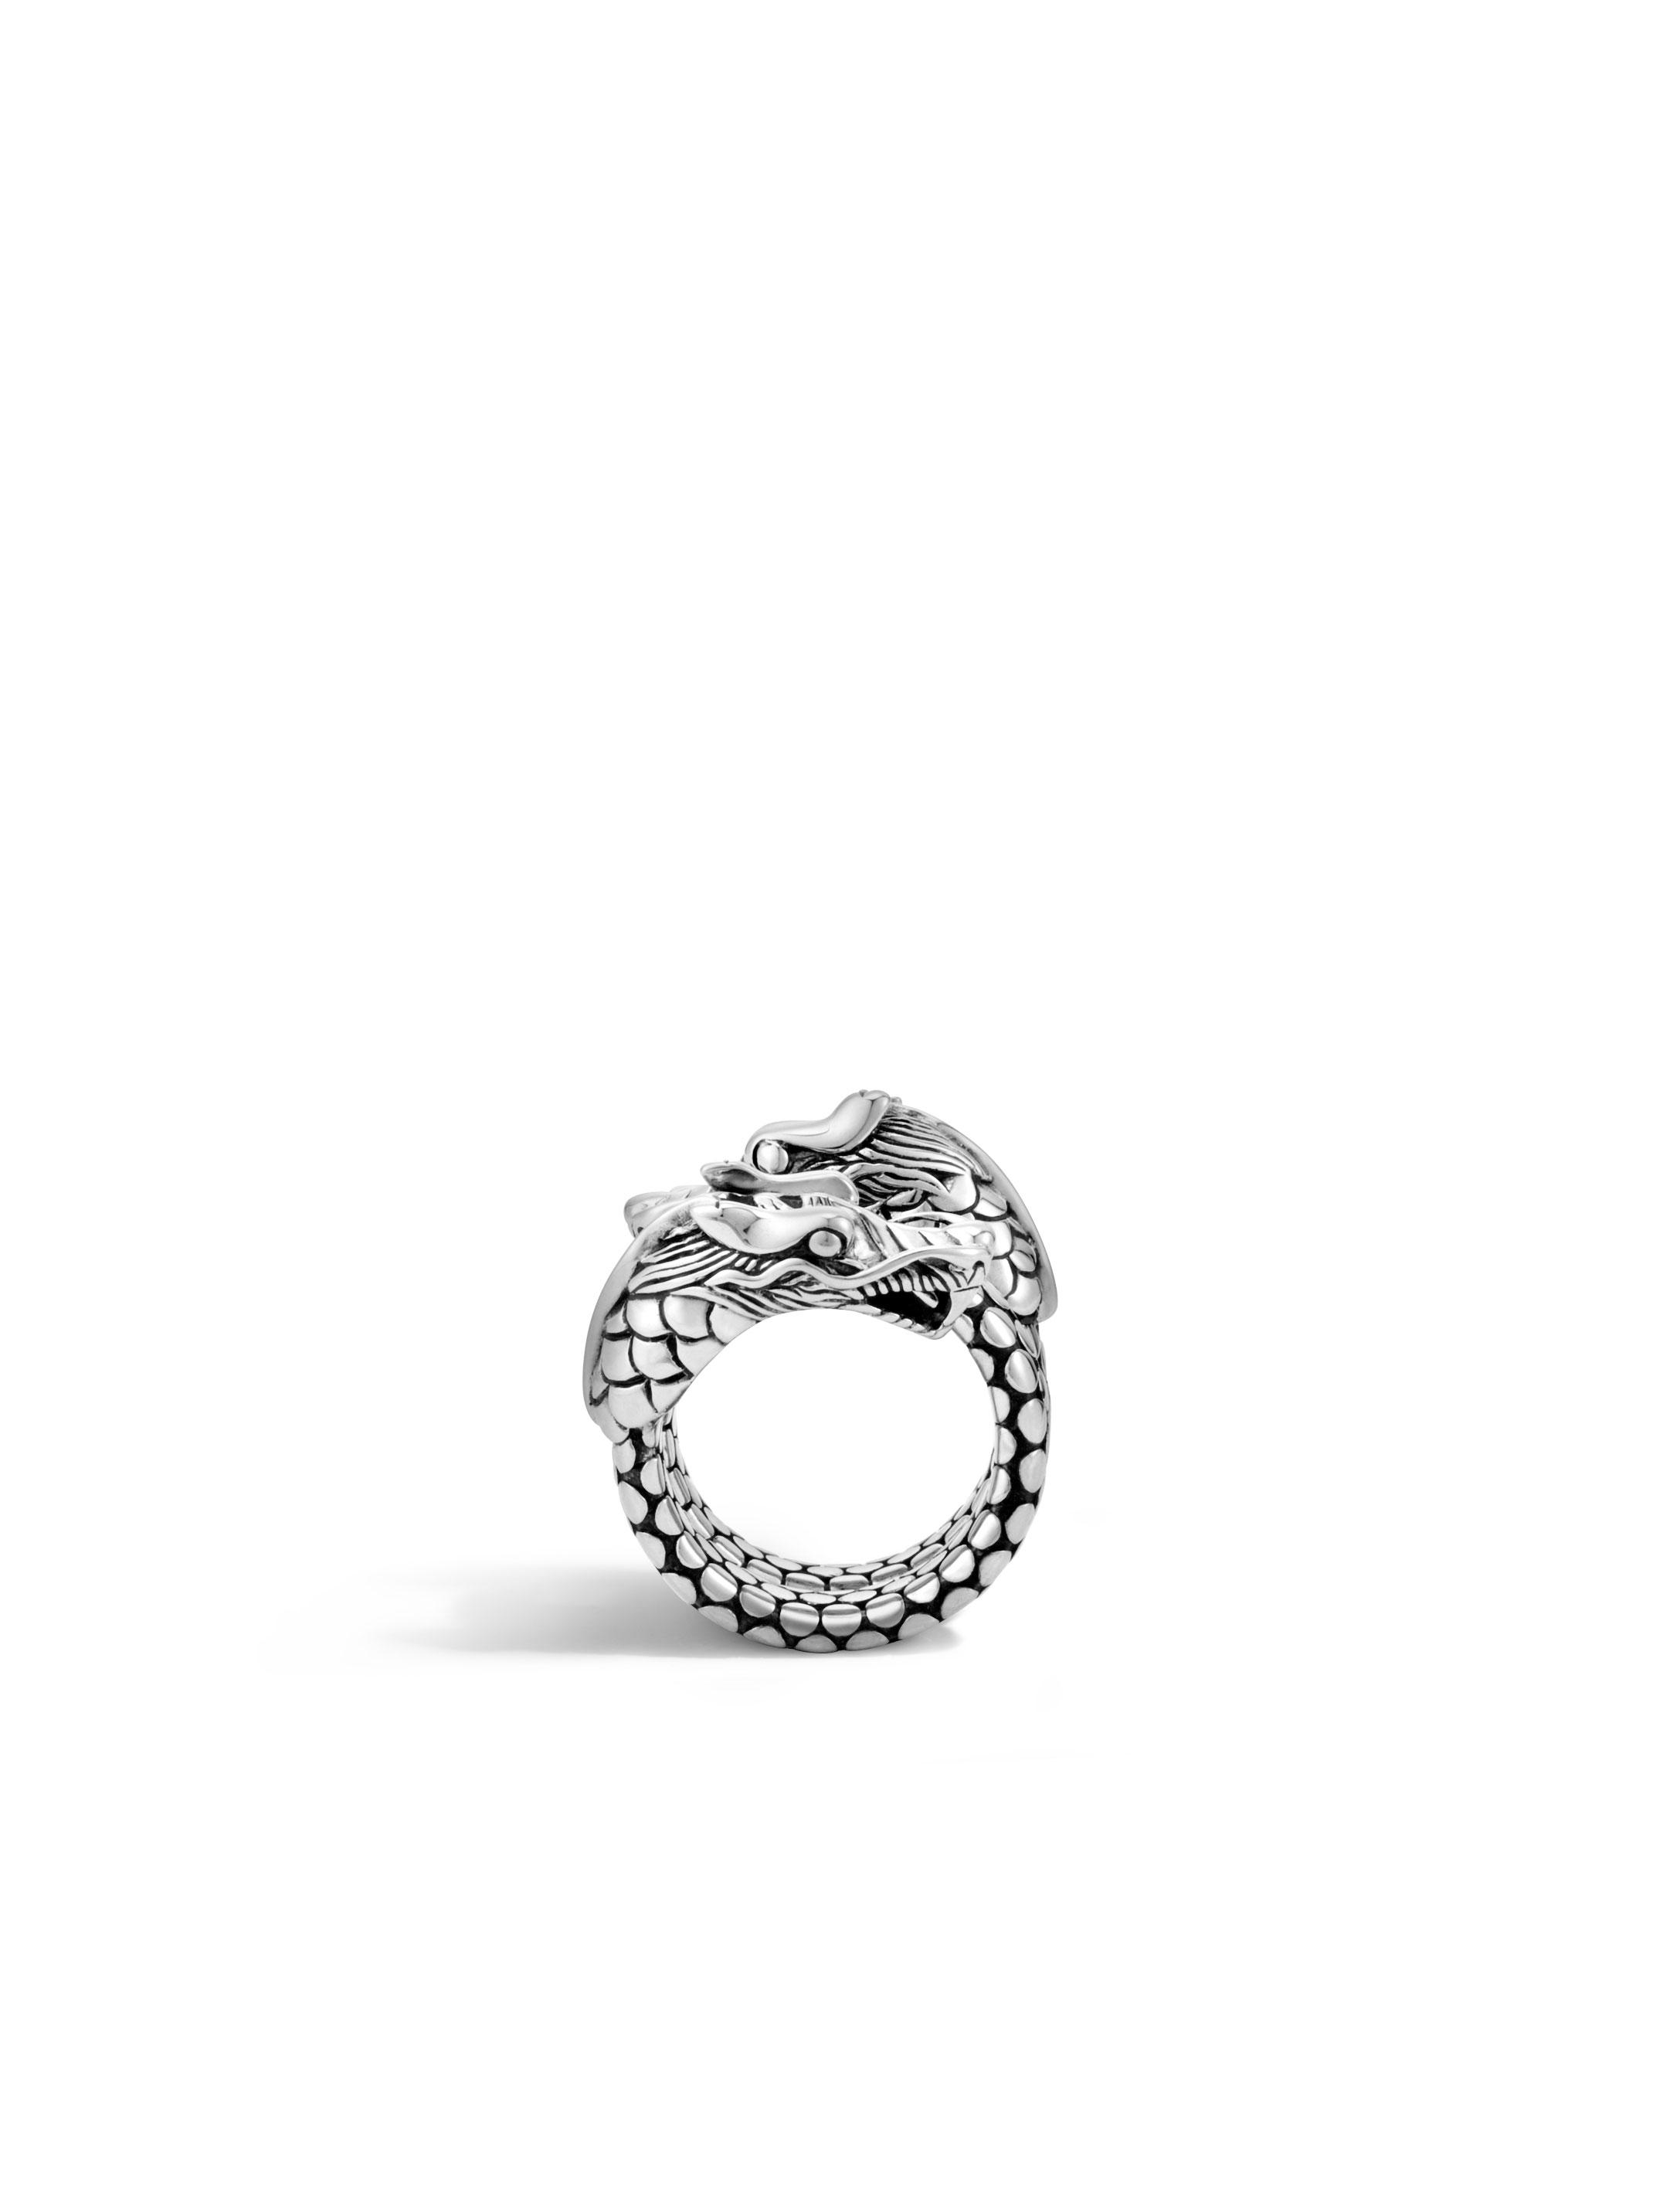 John Hardy Naga Coil Ring With Diamonds TbYNIvP7f